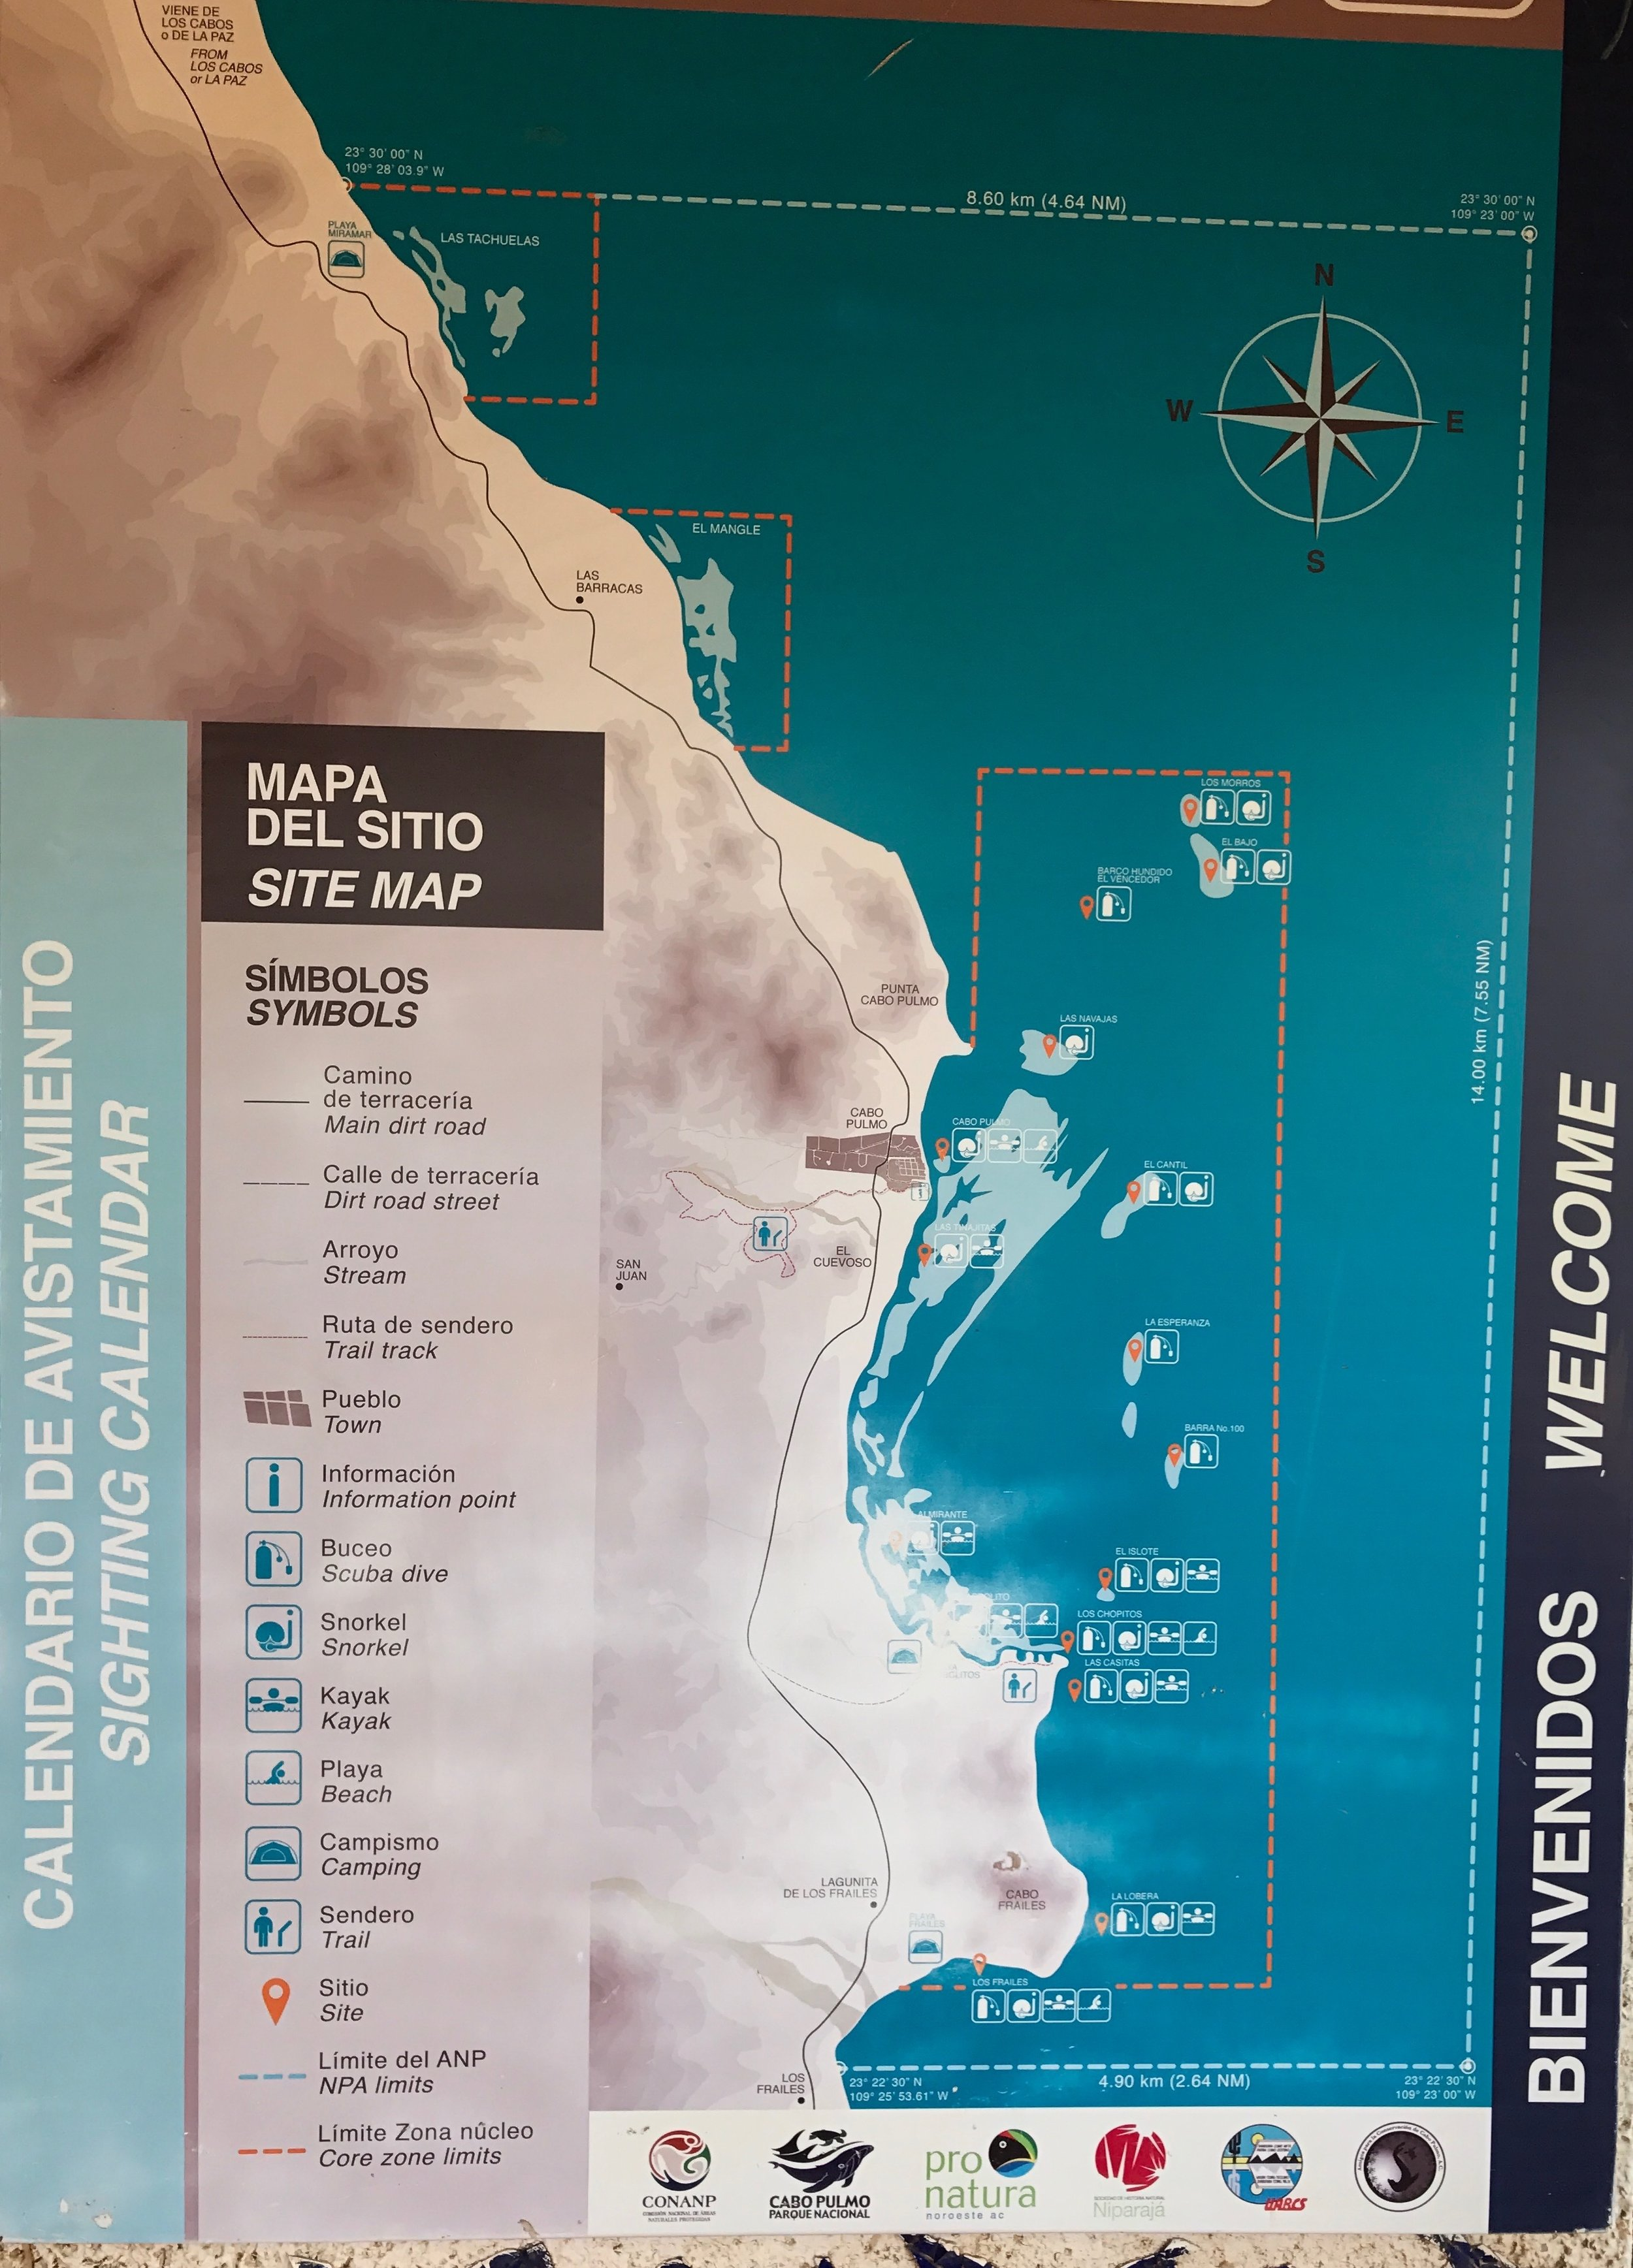 Cabo Pulmo Dive sites